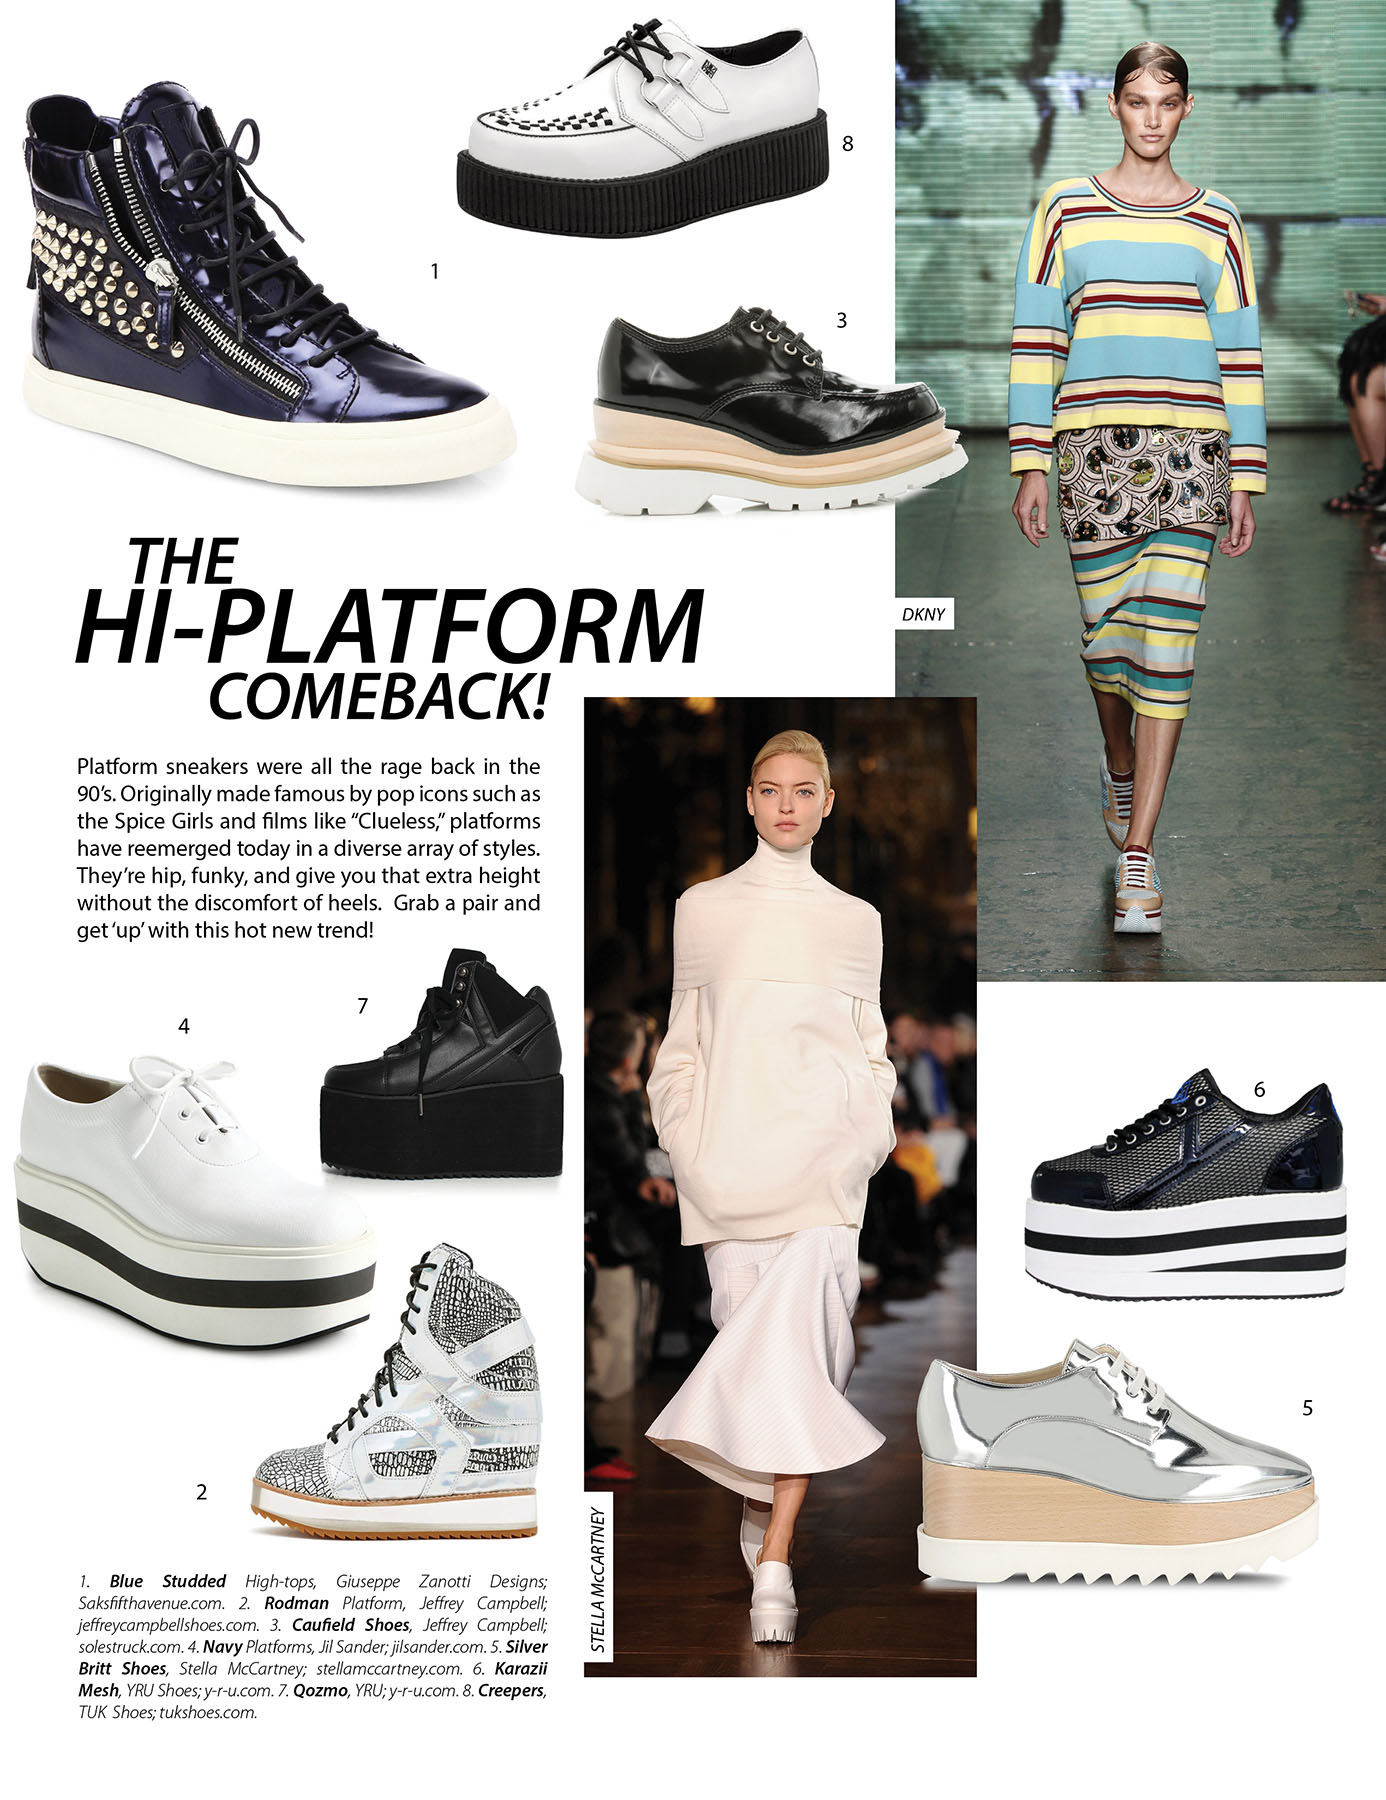 fb03ef01c7b The Hi-Platform Comeback! – Composure Magazine